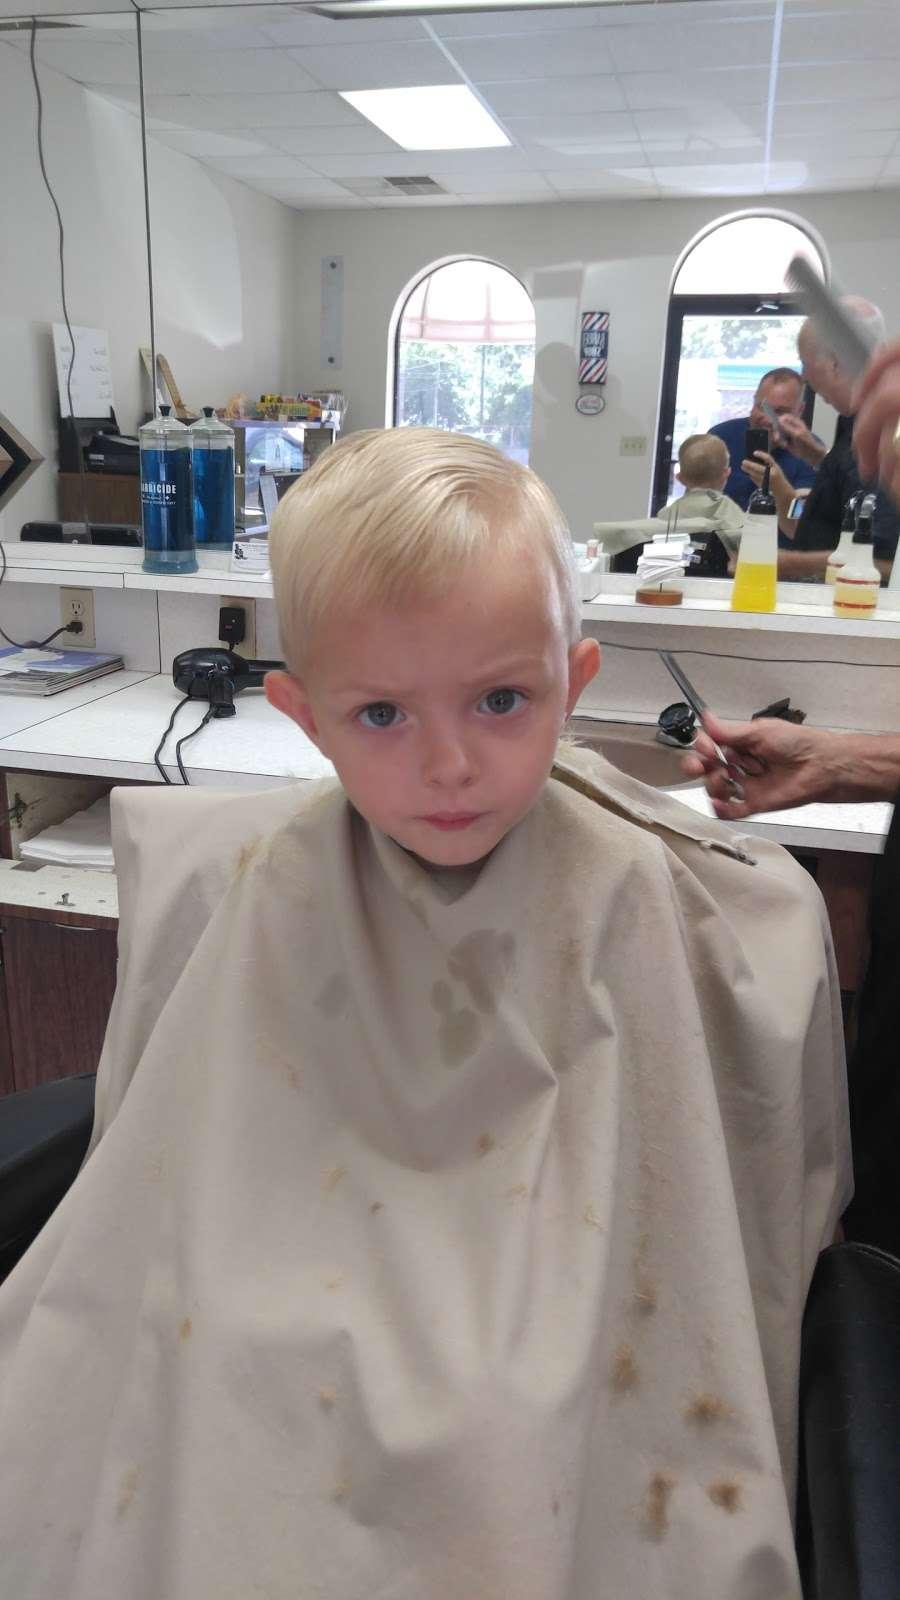 South Main Barber Shop - hair care  | Photo 1 of 1 | Address: 1008 S Main St suite 4, Salisbury, NC 28144, USA | Phone: (704) 798-4854